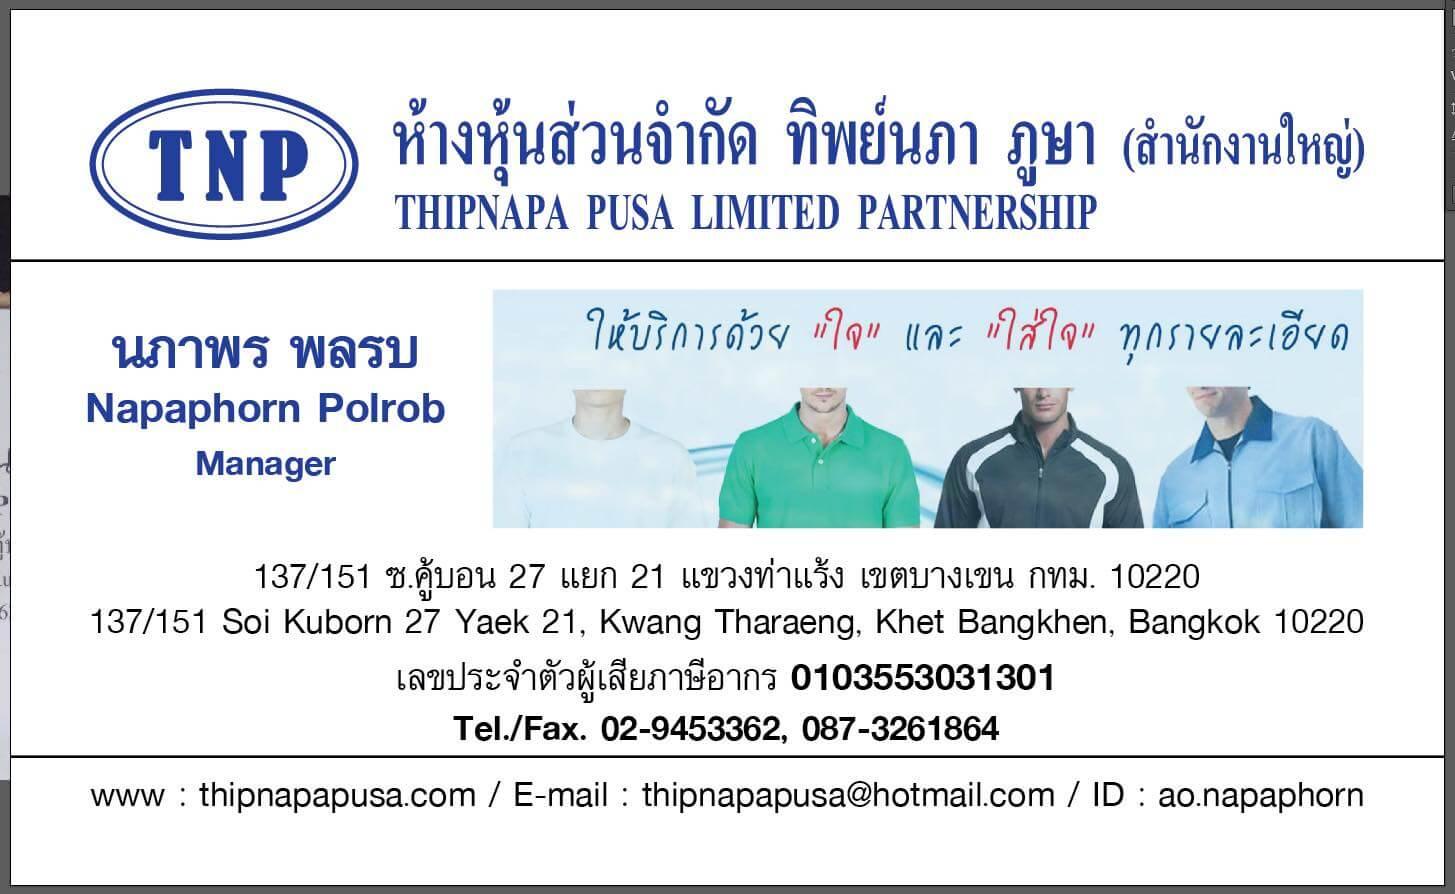 Thipnapapusa รับออกแบบ เสื้อคนงาน ตามสั่ง